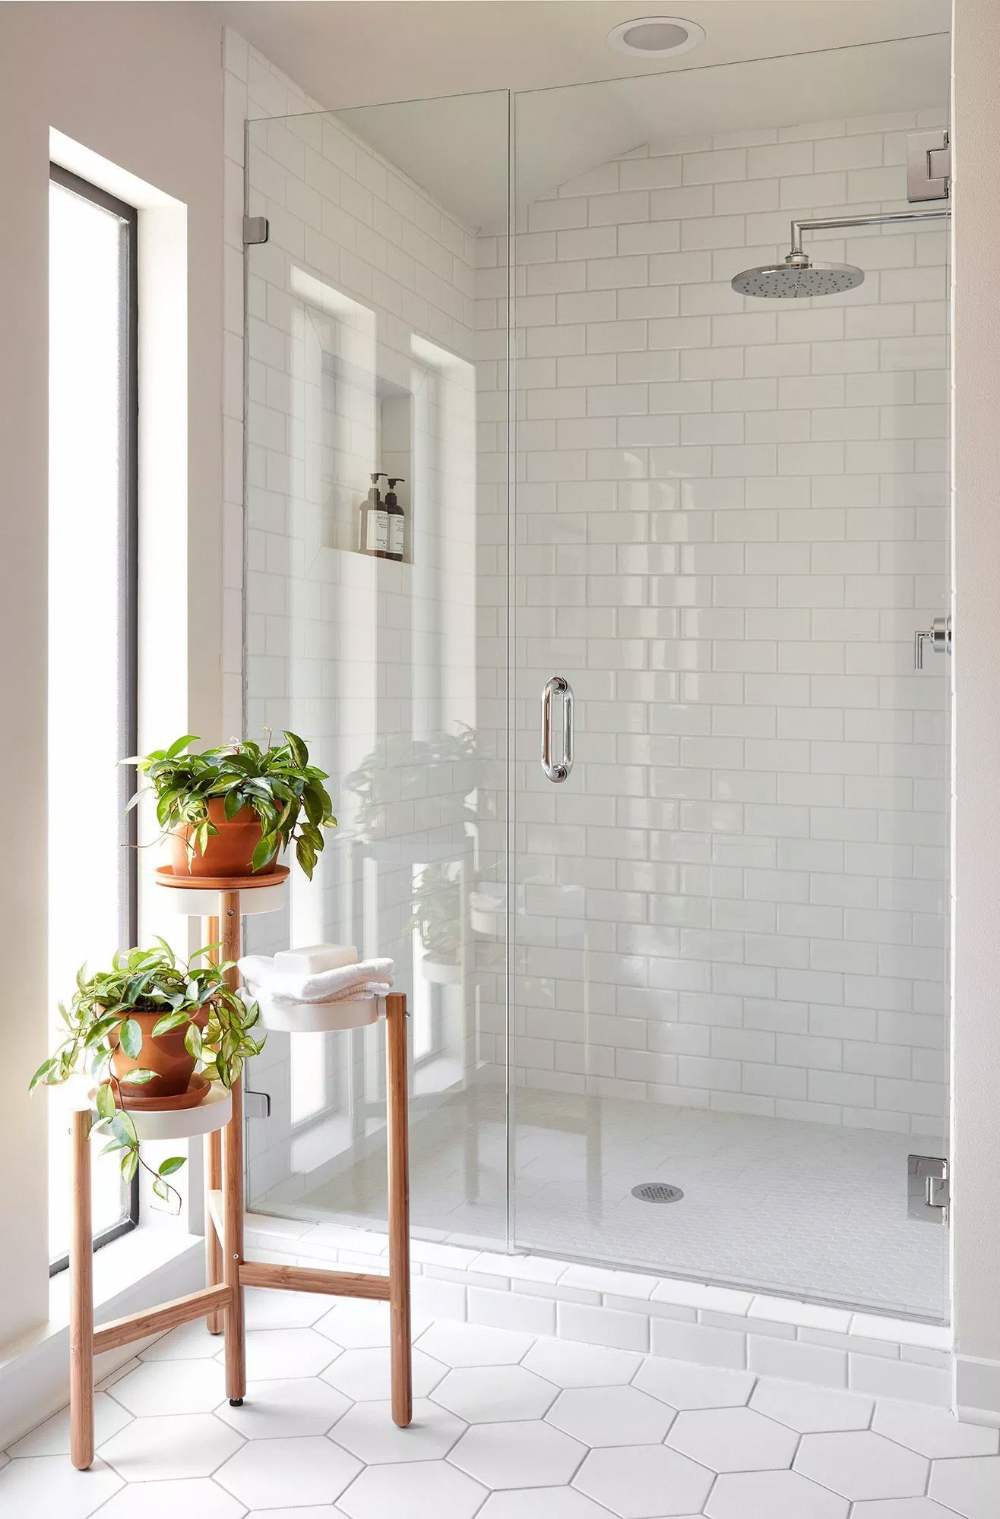 23 Modern White Bathroom Ideas Designs For 2019 Bathroomrenovations Modern White Bathroom Modern Bathroom Tile Modern Bathroom Design